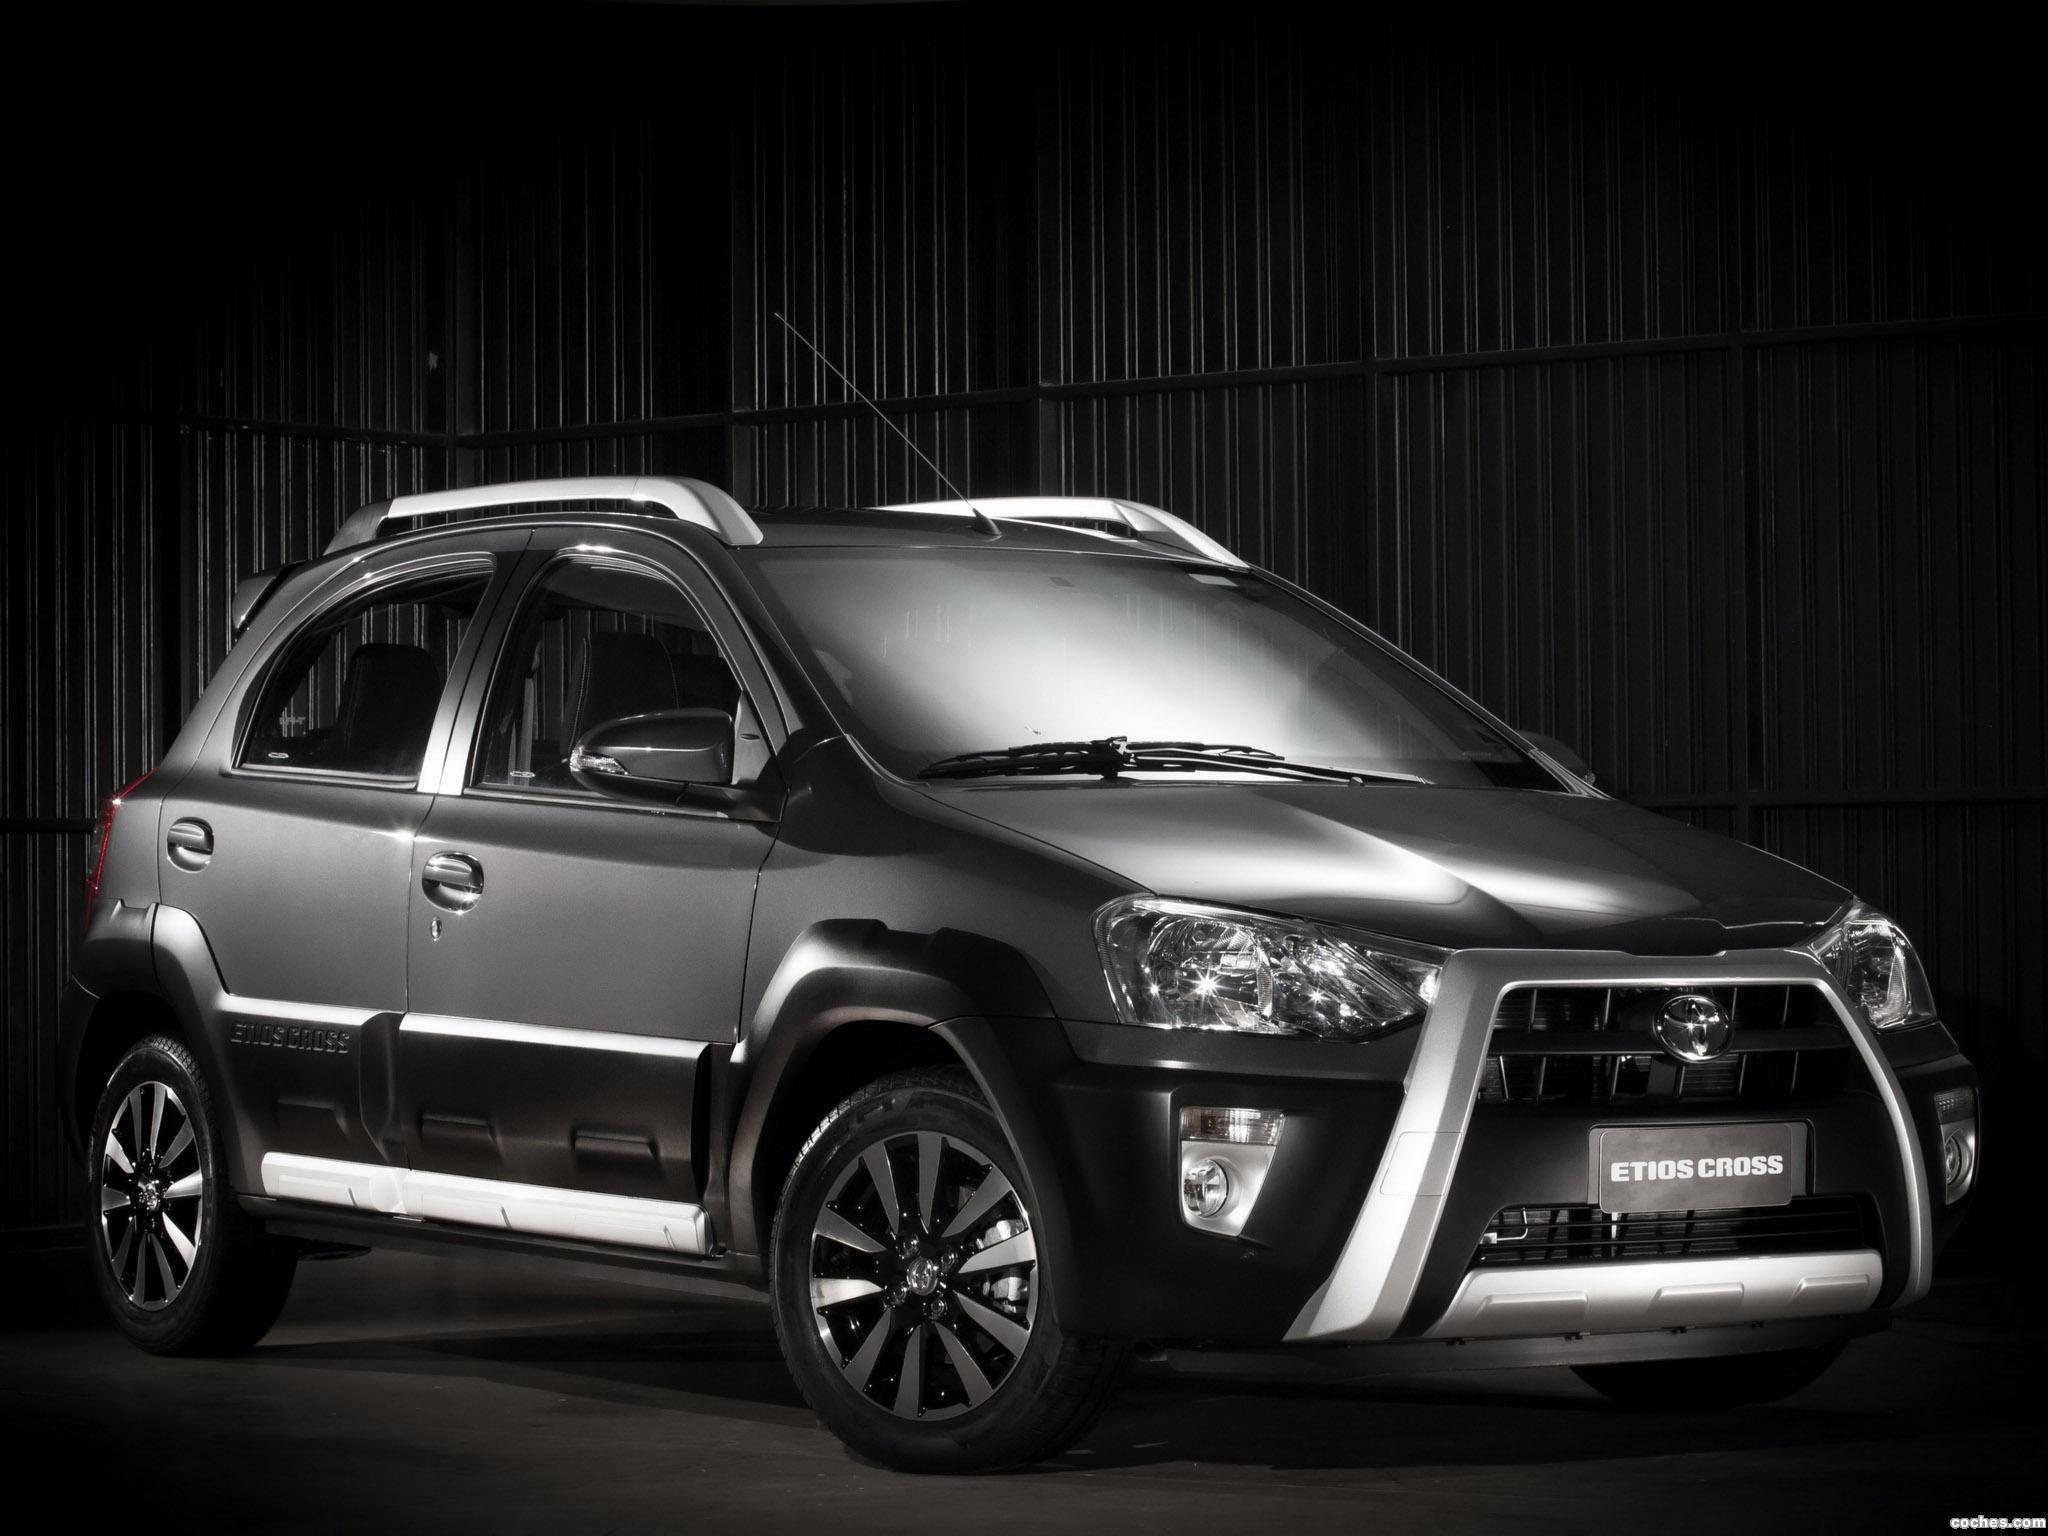 Foto 0 de Toyota Etios Cross 2013